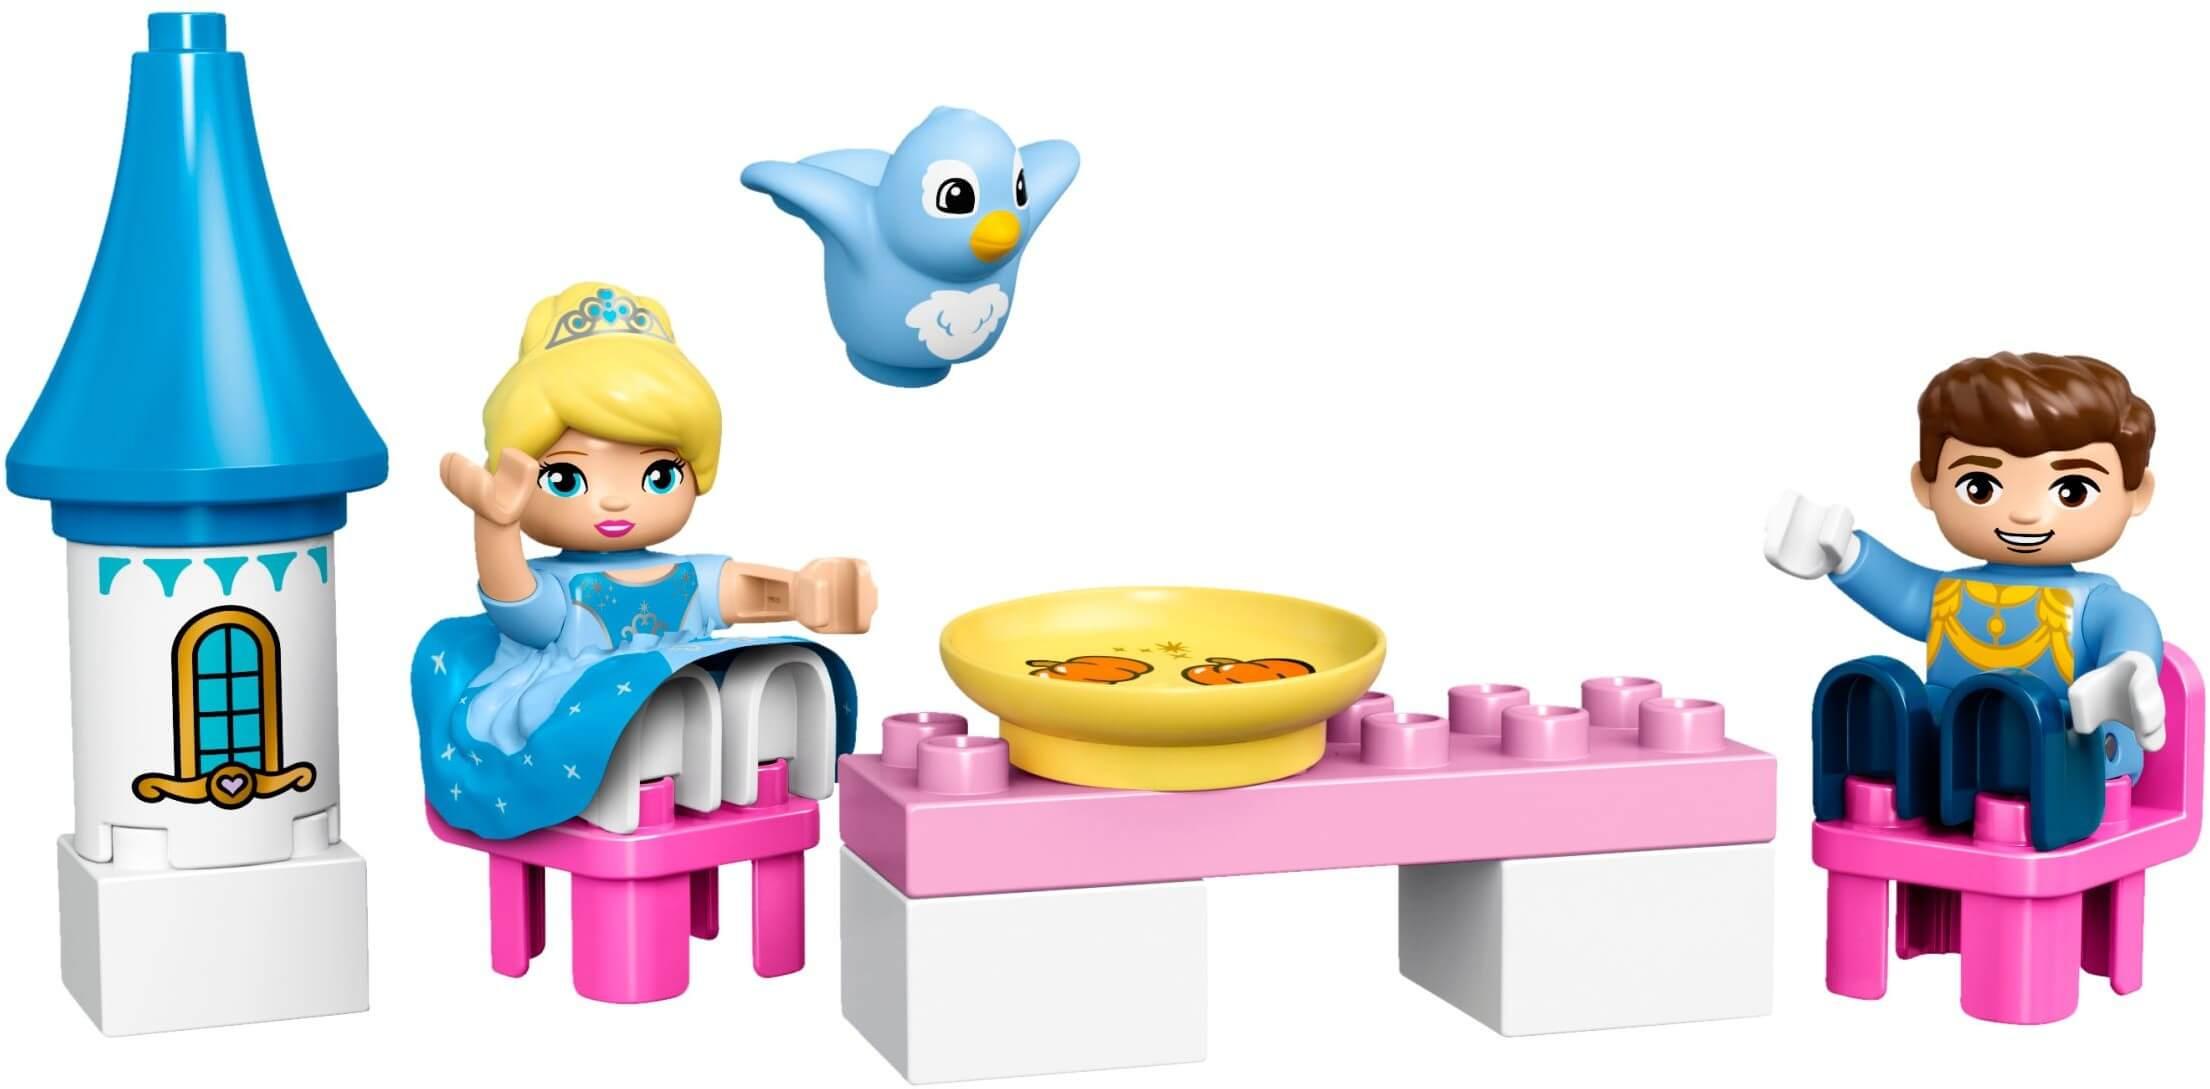 Mua đồ chơi LEGO 10855 - LEGO DUPLO 10855 - Lâu Đài của Lọ Lem Cinderella (LEGO 10855 Cinderella´s Magical Castle)